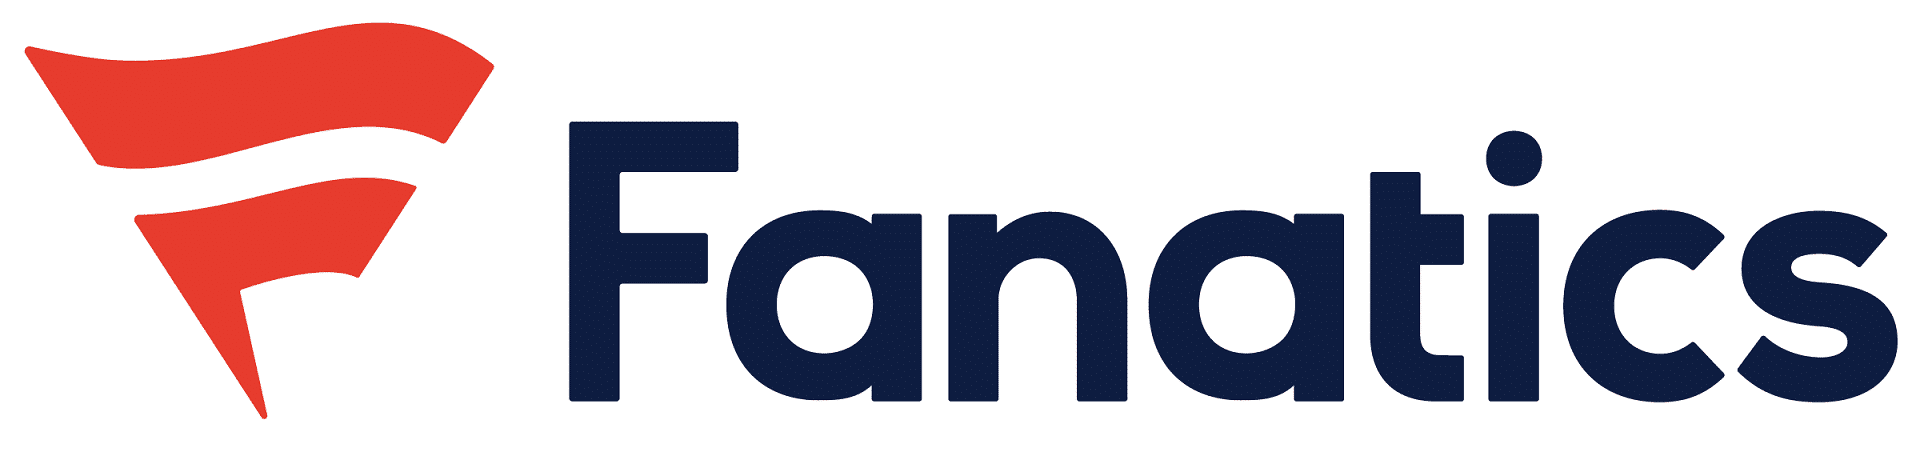 Fanatics Clearance Sale